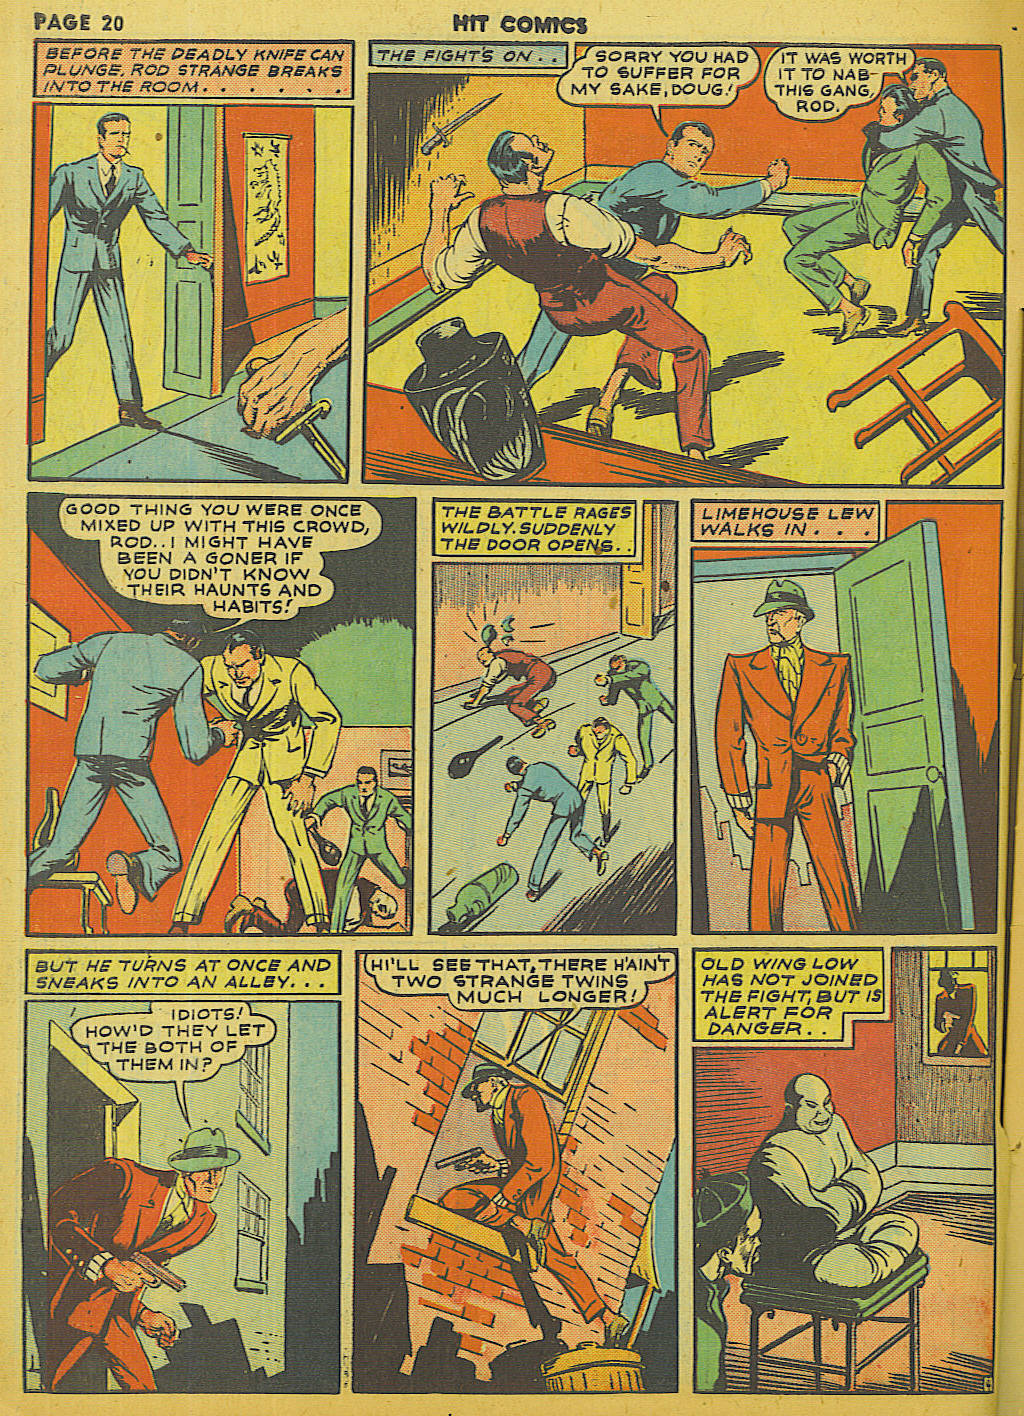 Read online Hit Comics comic -  Issue #13 - 22